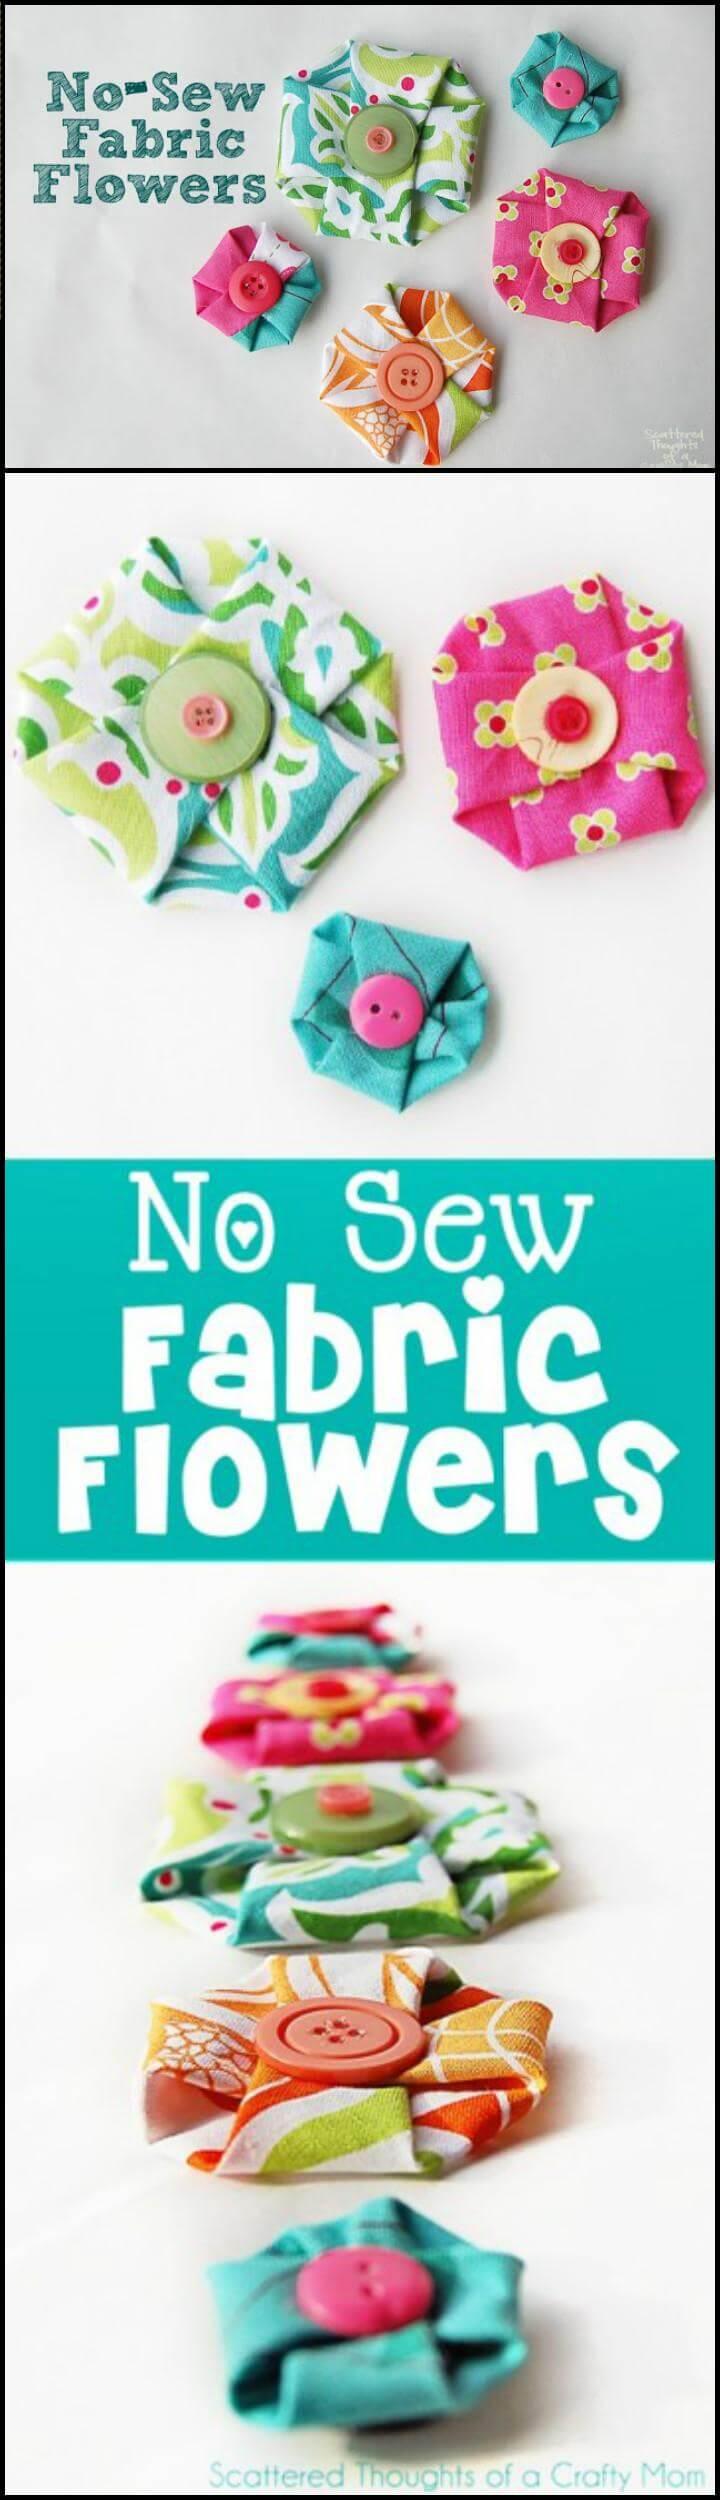 Diy No Sew Fabric Flower Via Ruffles And Stuff